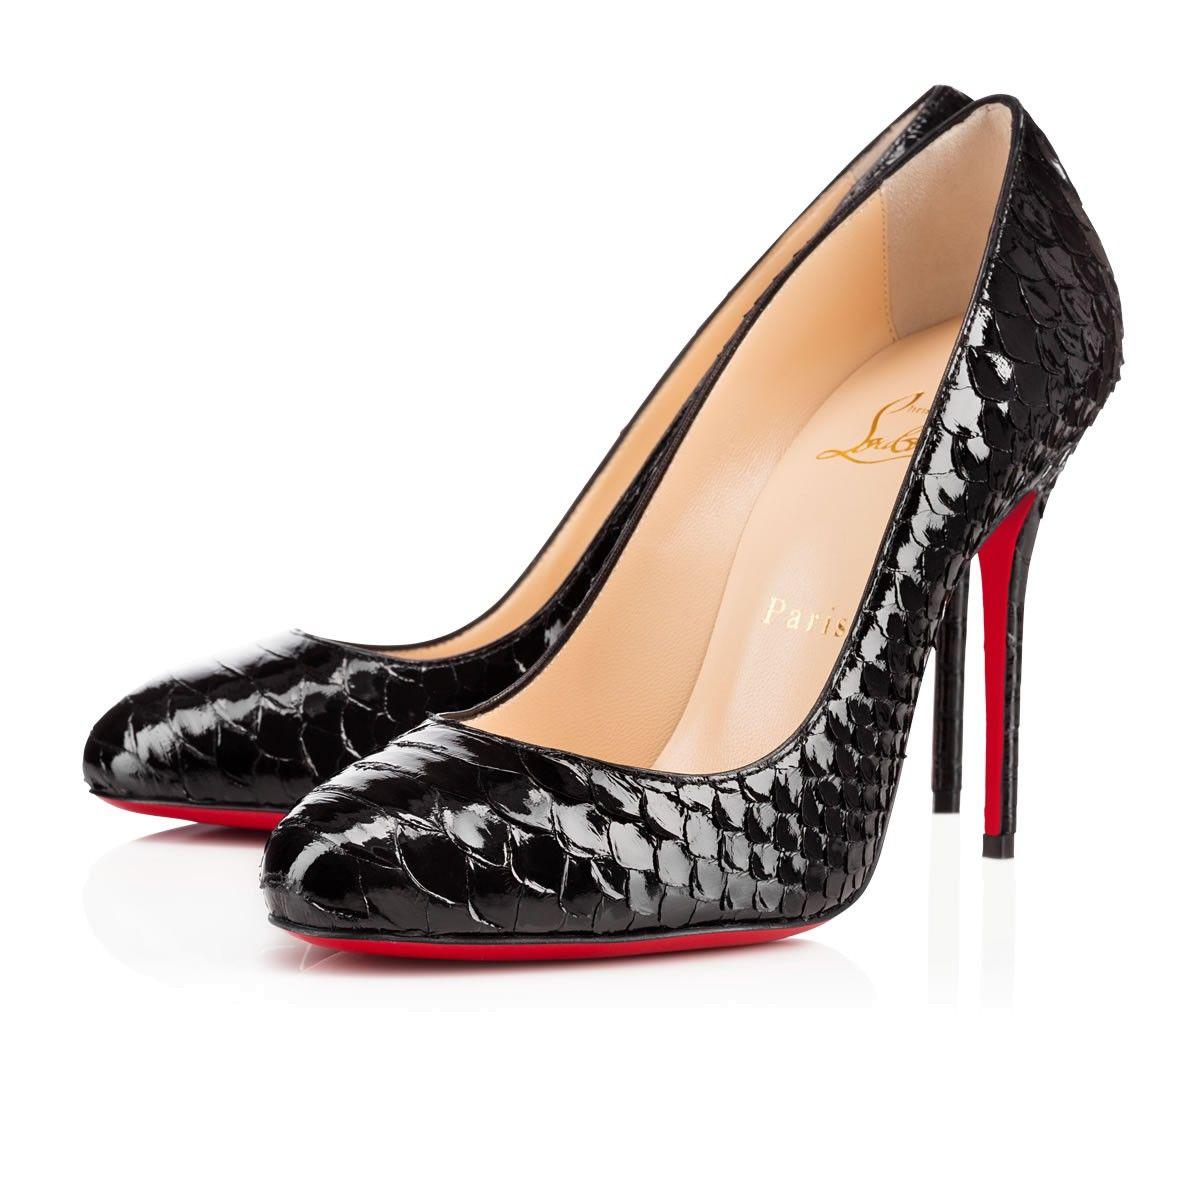 8226280b558 Women Shoes - Fifi Python Crystal - Christian Louboutin